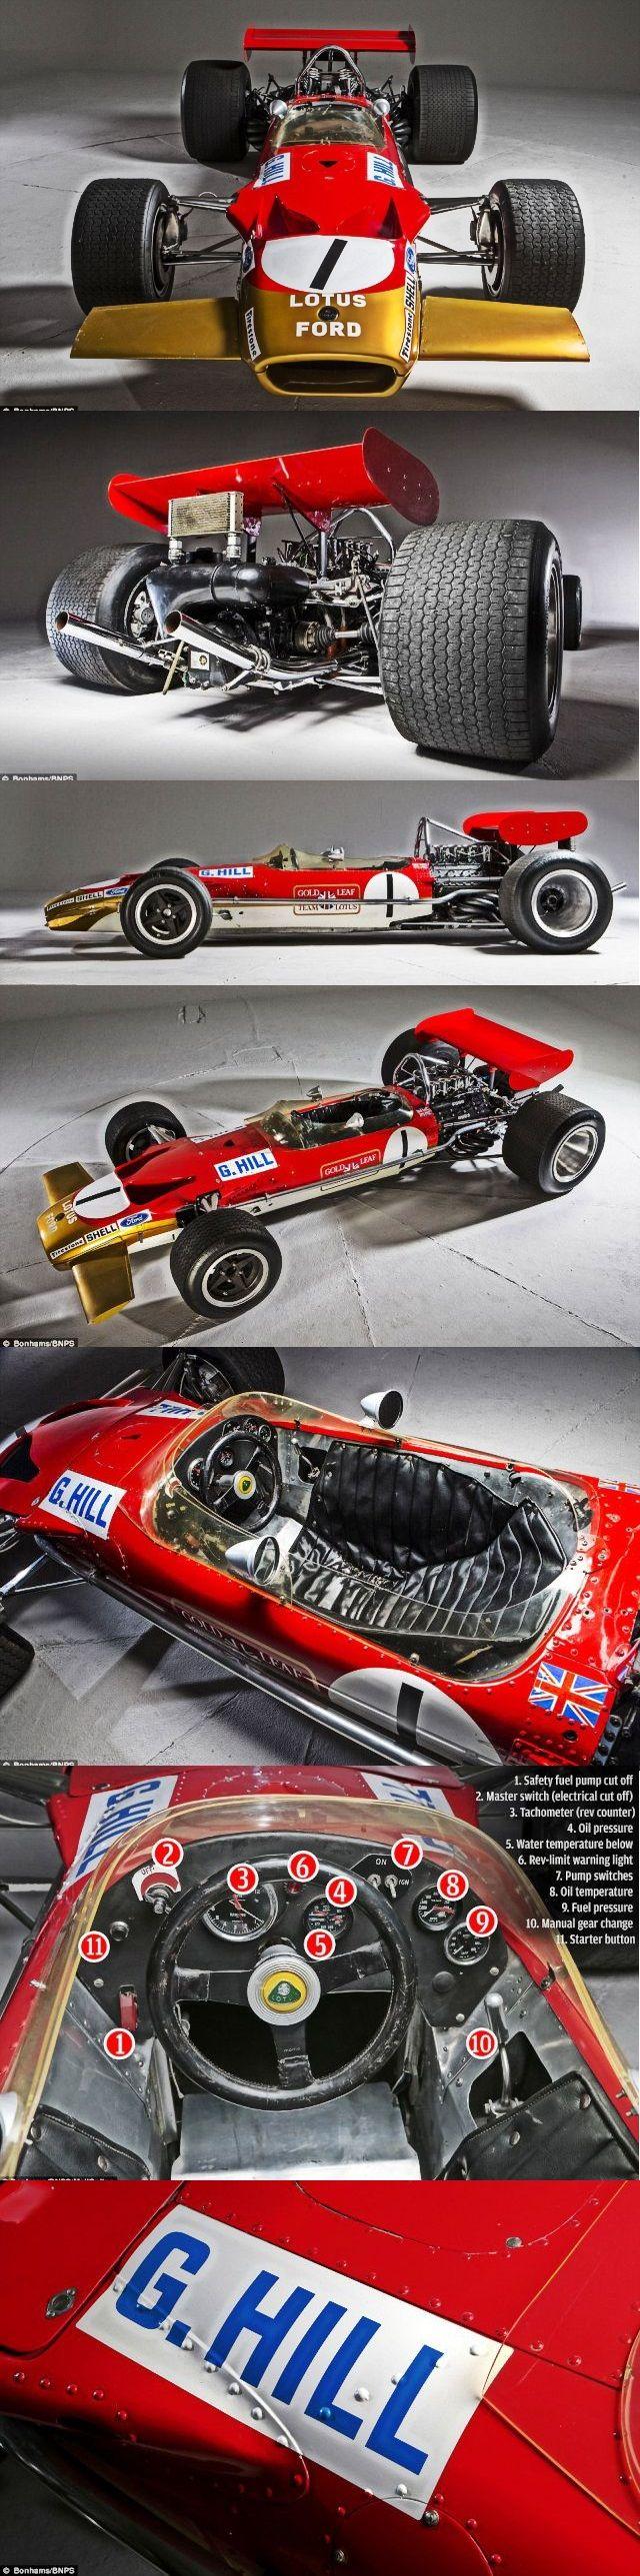 —– The Lotus 49B —— the British world champion in 1968 —- Graham Hill